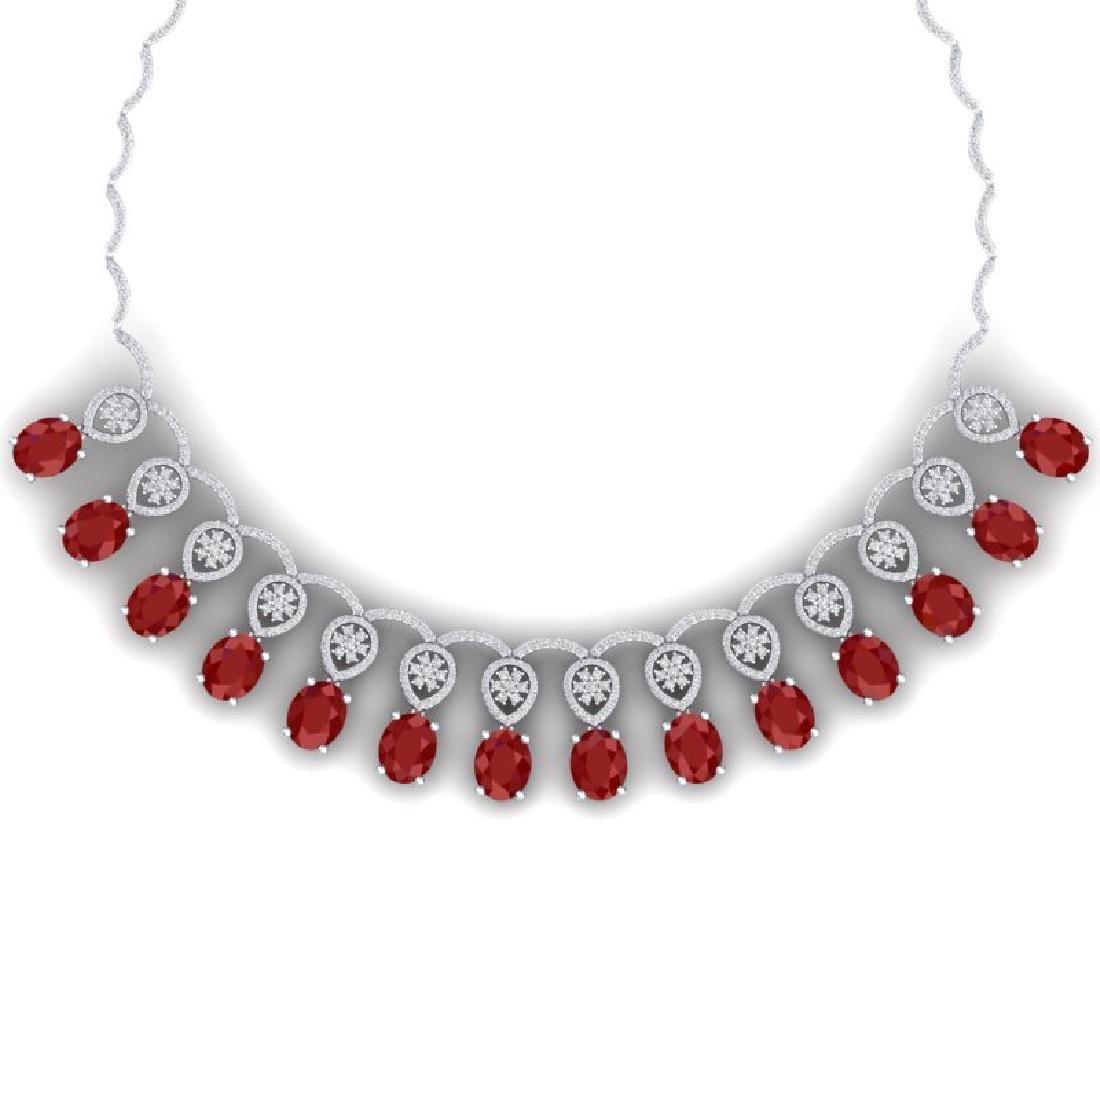 54.05 CTW Royalty Ruby & VS Diamond Necklace 18K White